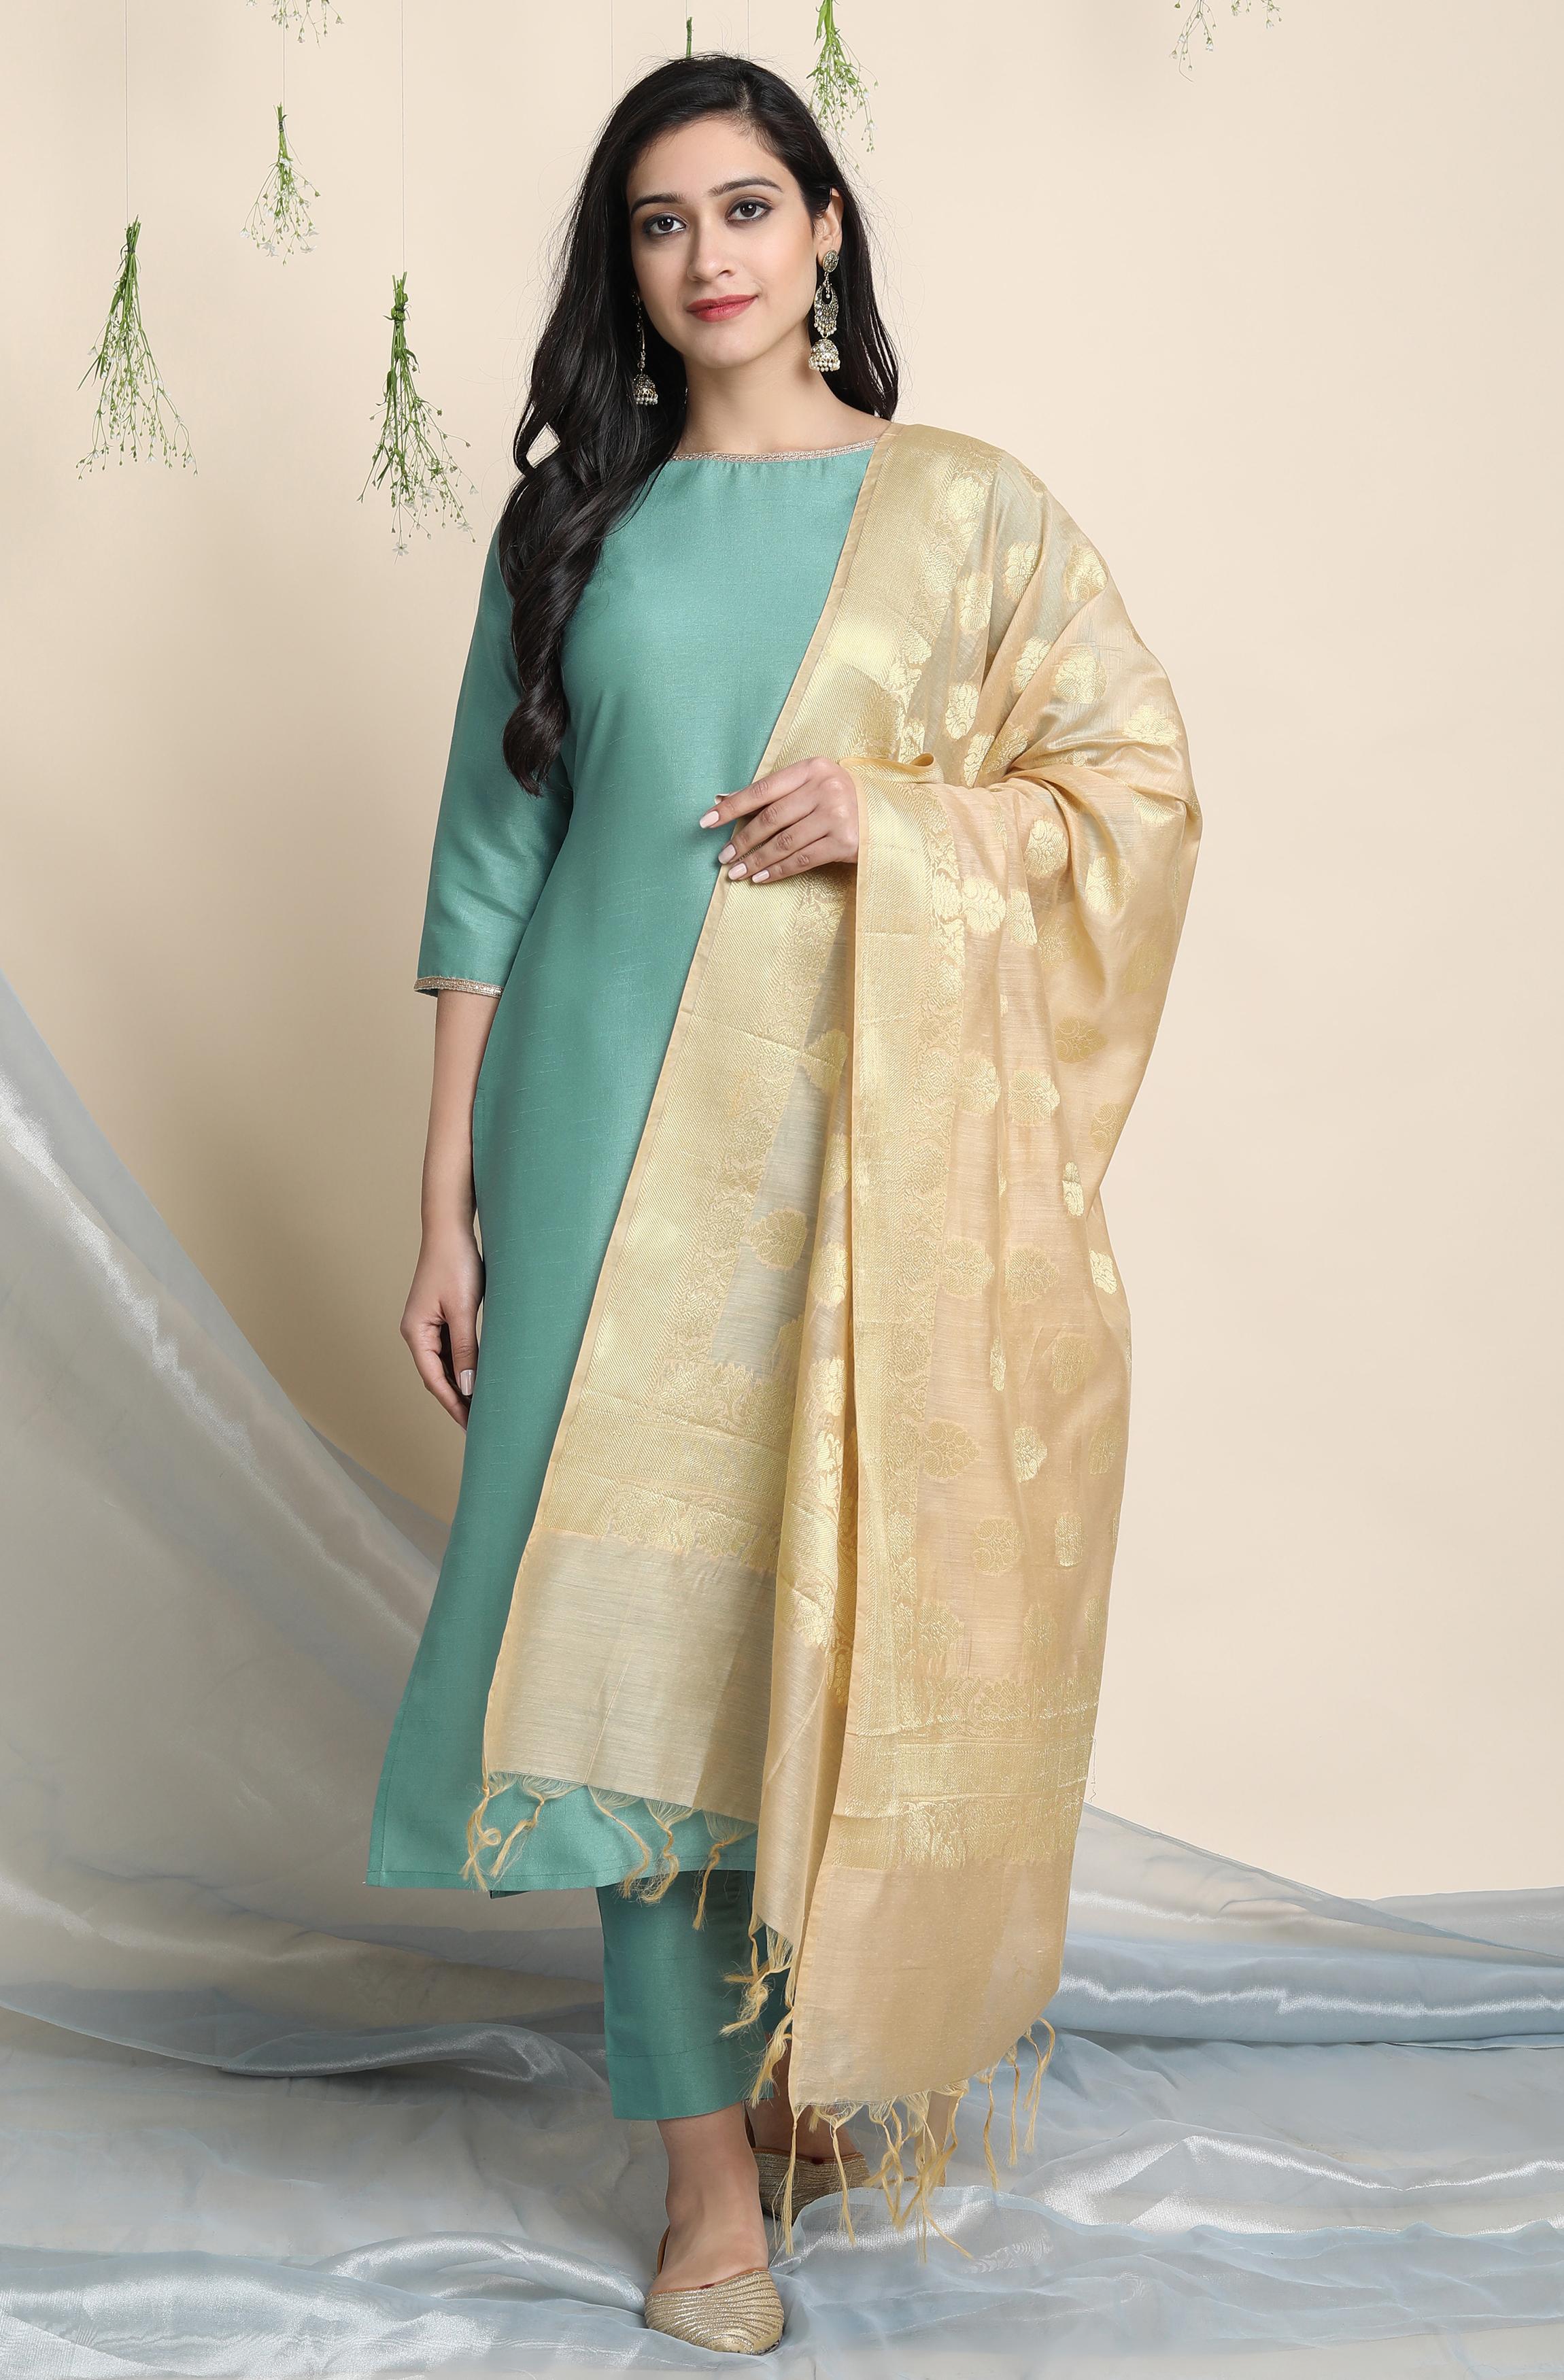 Janasya | Janasya Women's Green Poly Silk Kurta With Pant and Dupatta